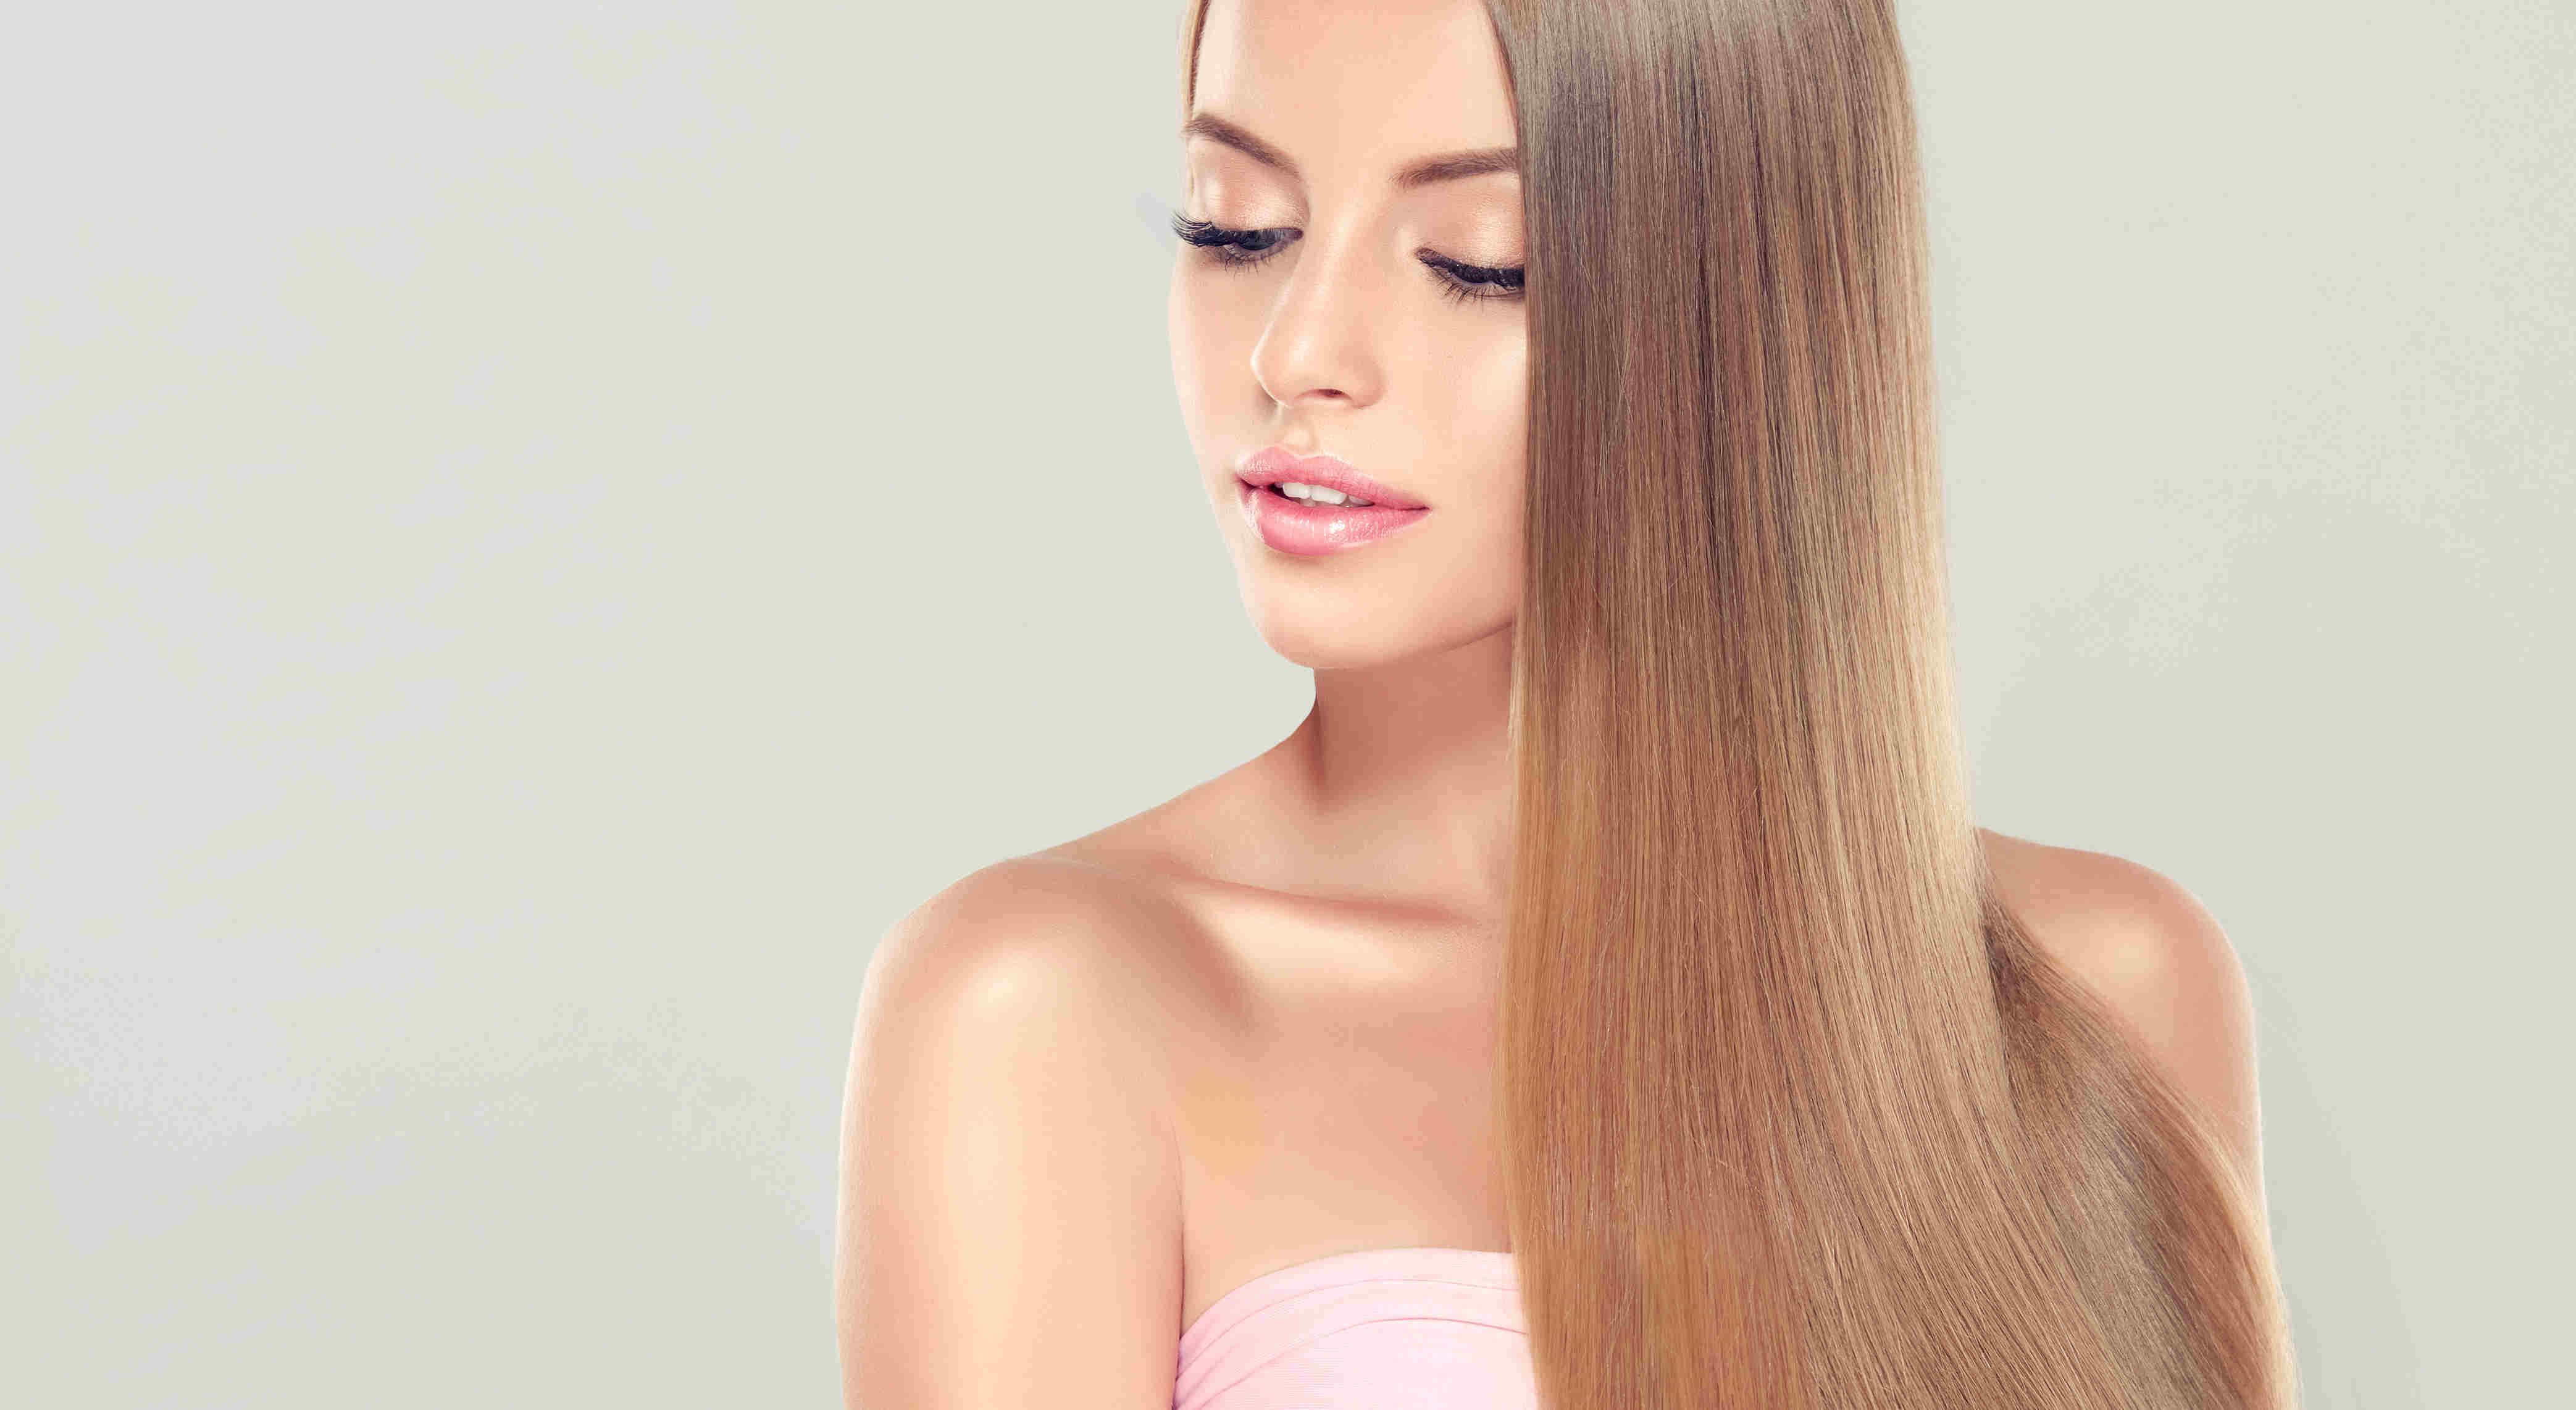 Junge Frau mit gepflegten Haaren